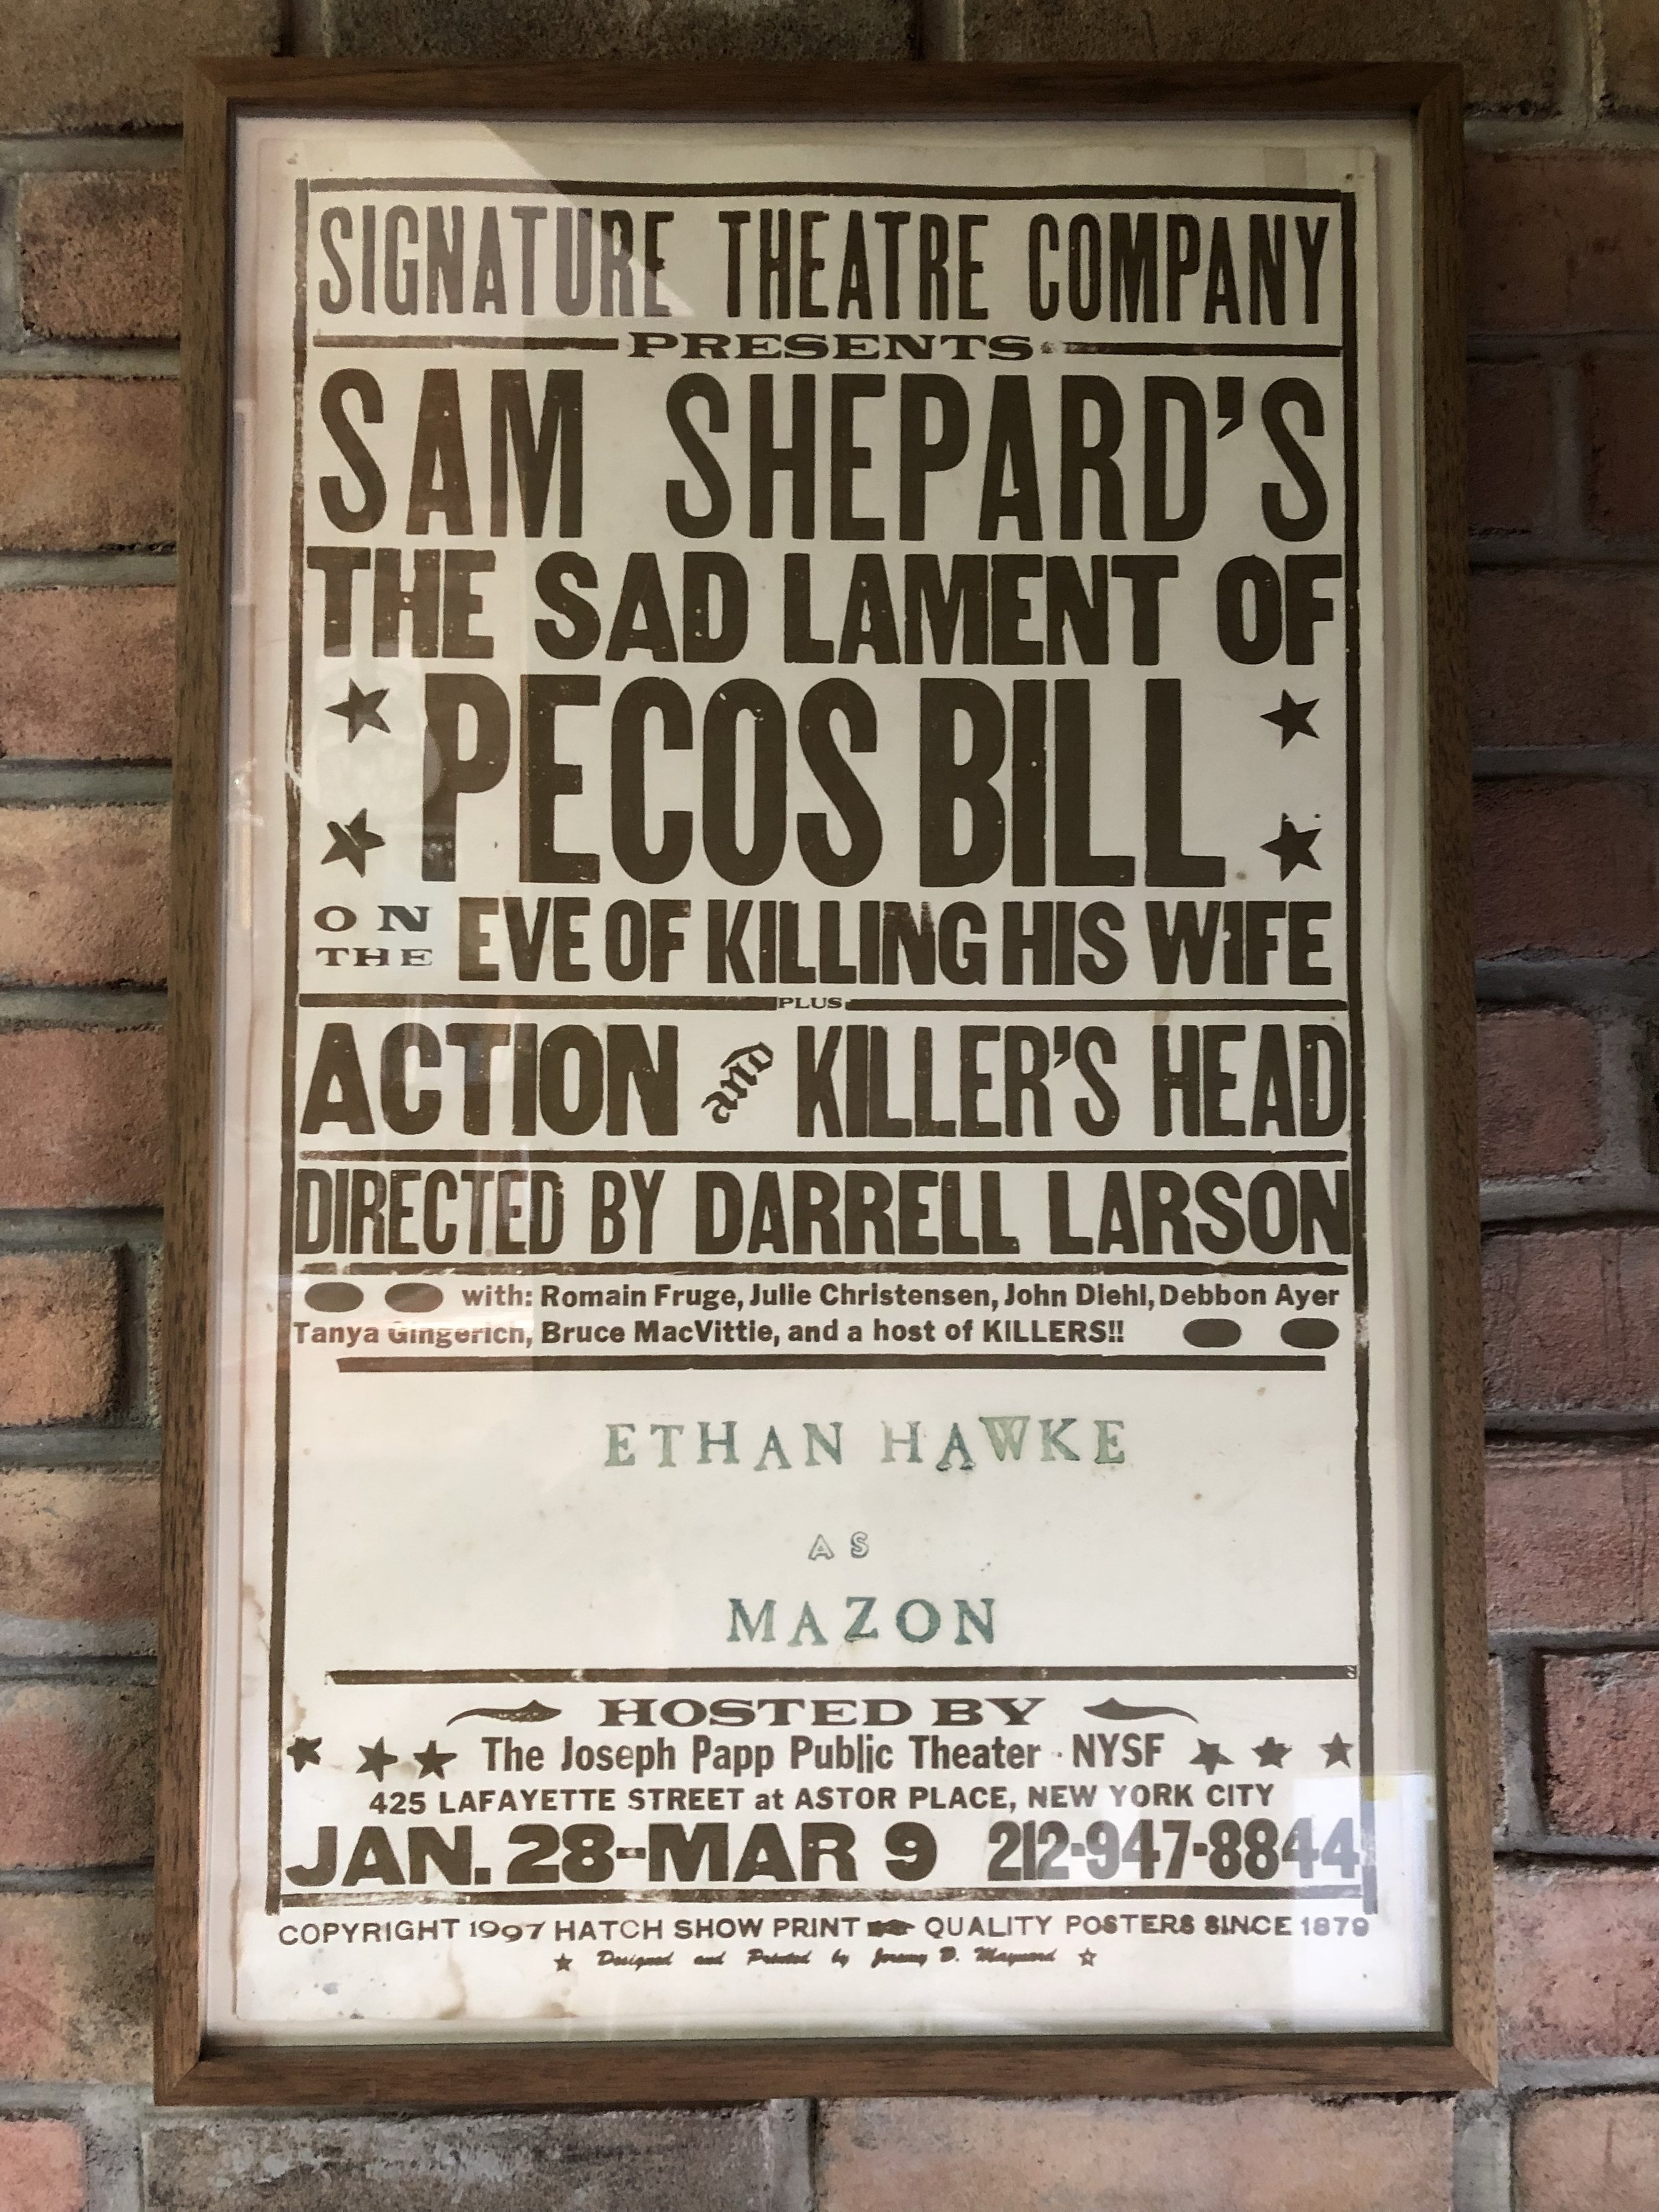 1997 Sad Lament of Pecos Bill Poster Photo.jpg